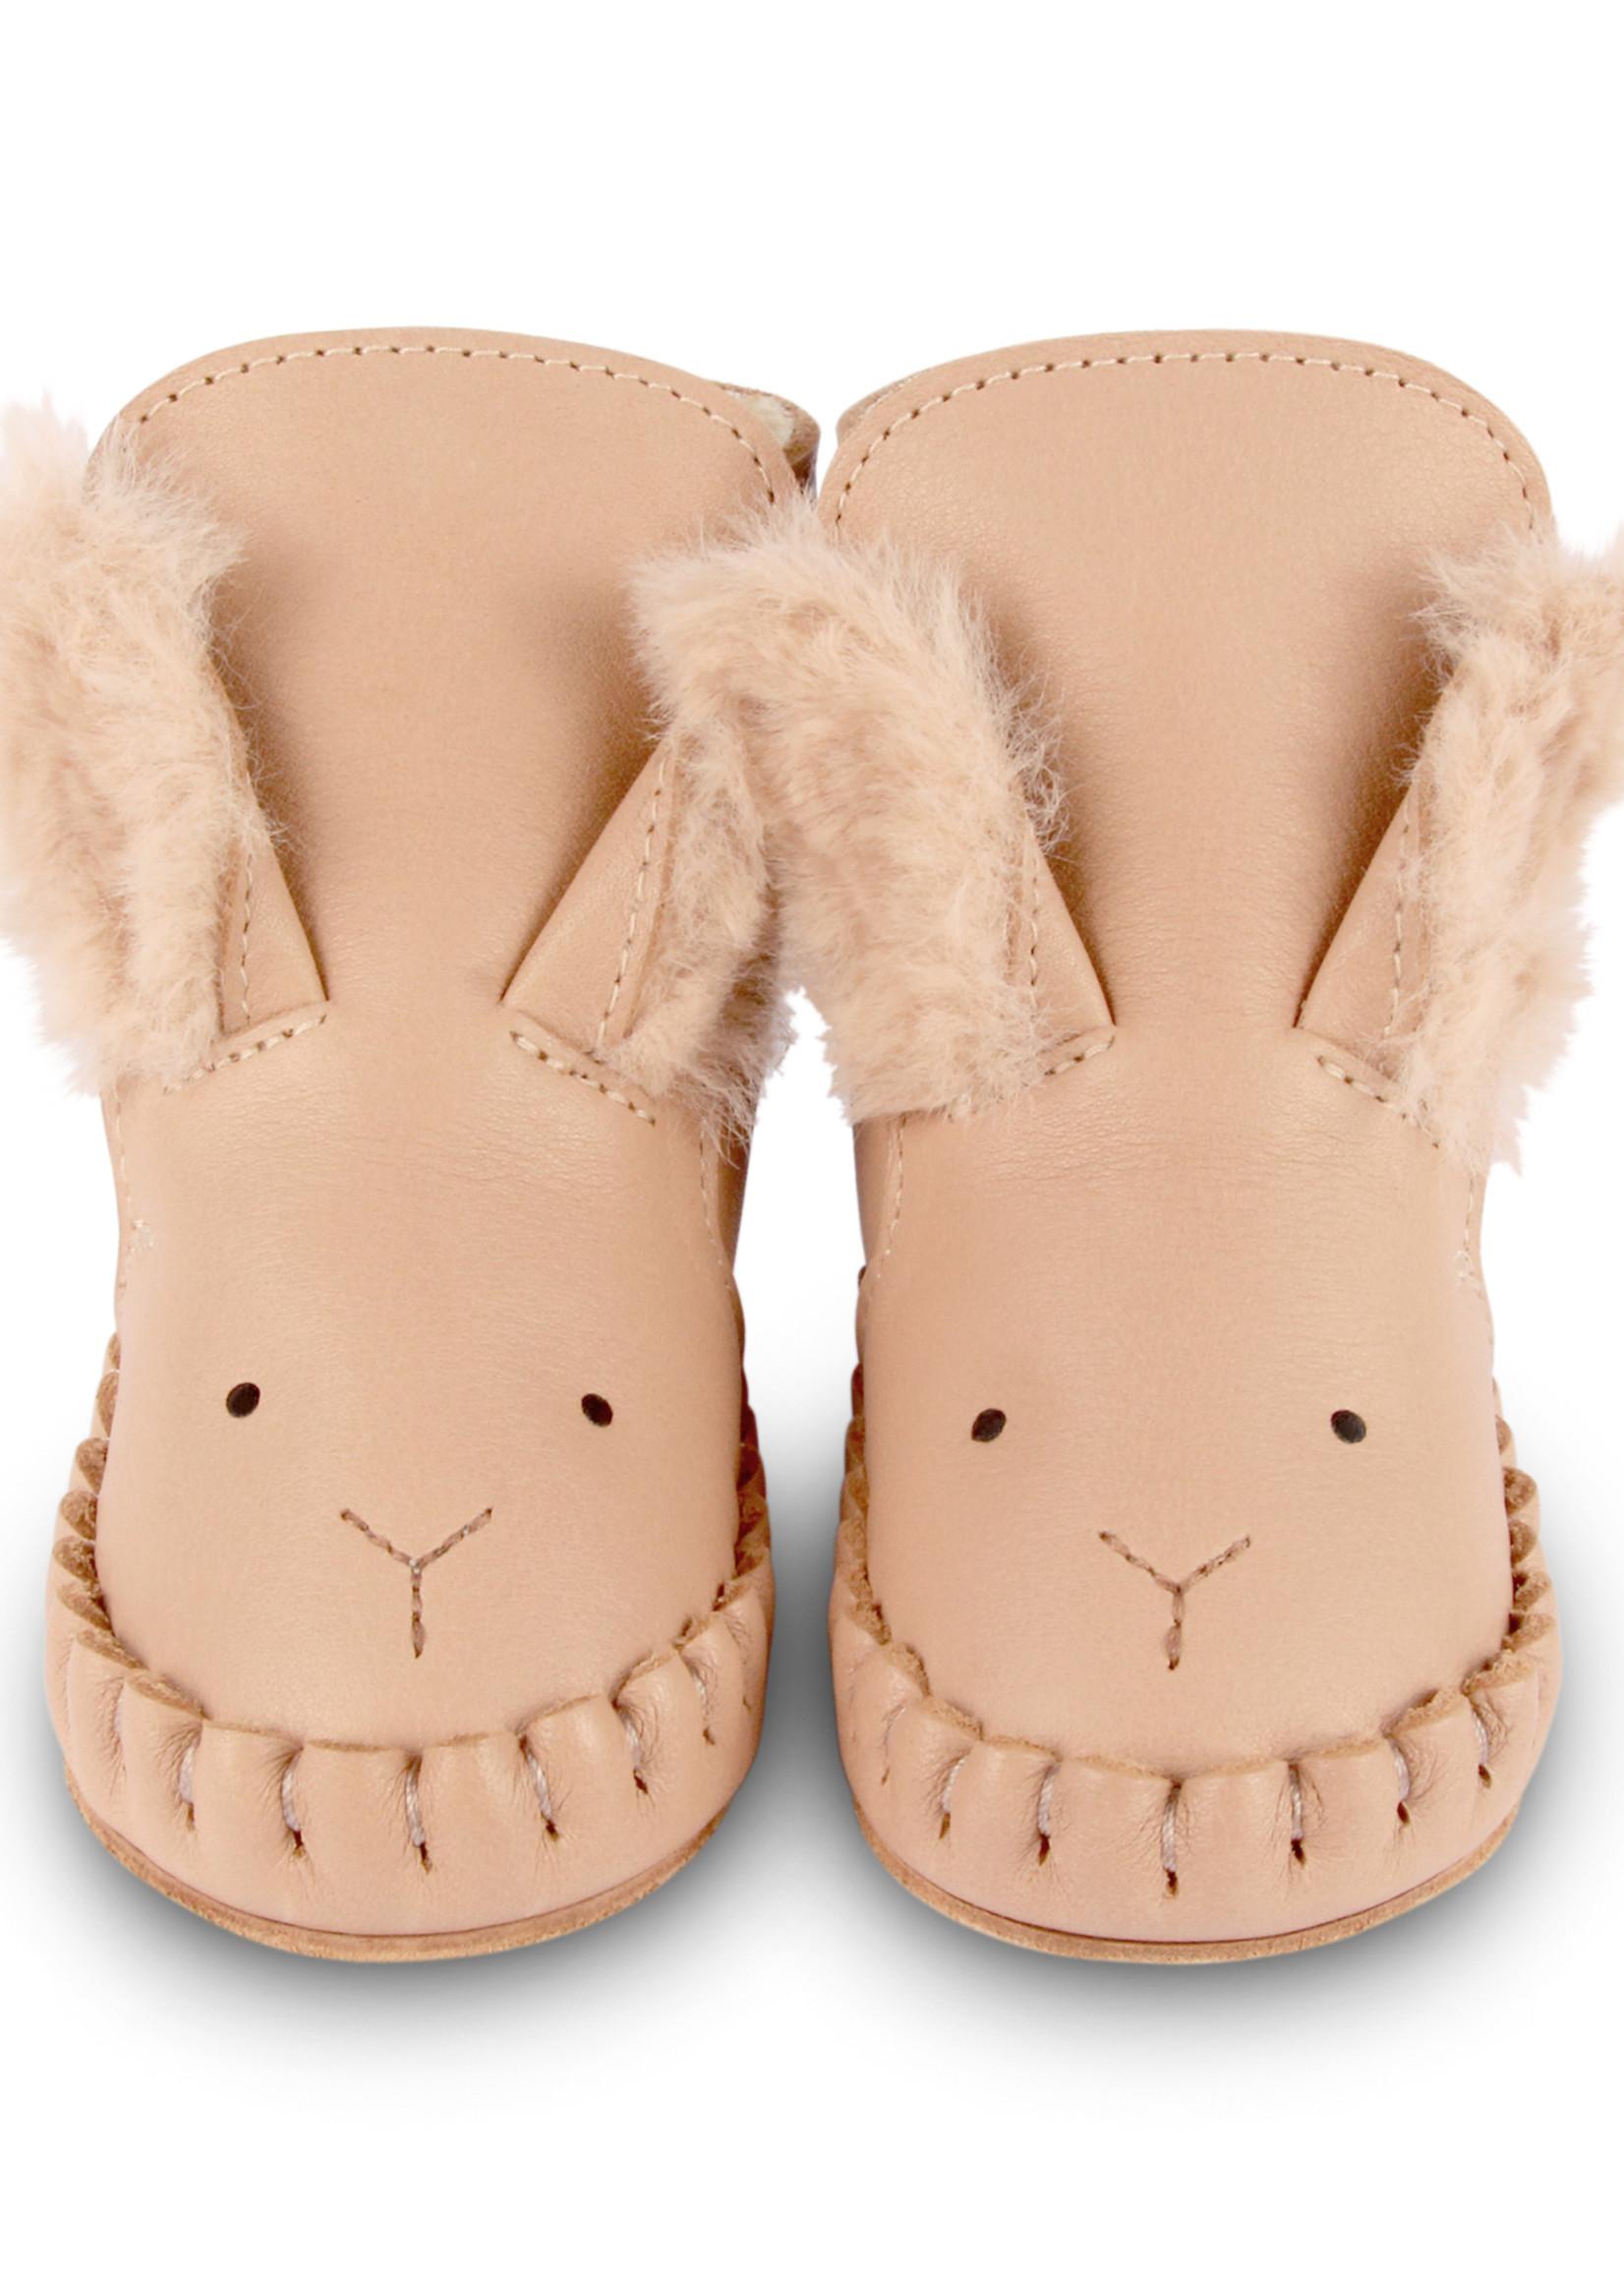 Donsje Amsterdam Kapi Exclusive Lining - Winter Bunny